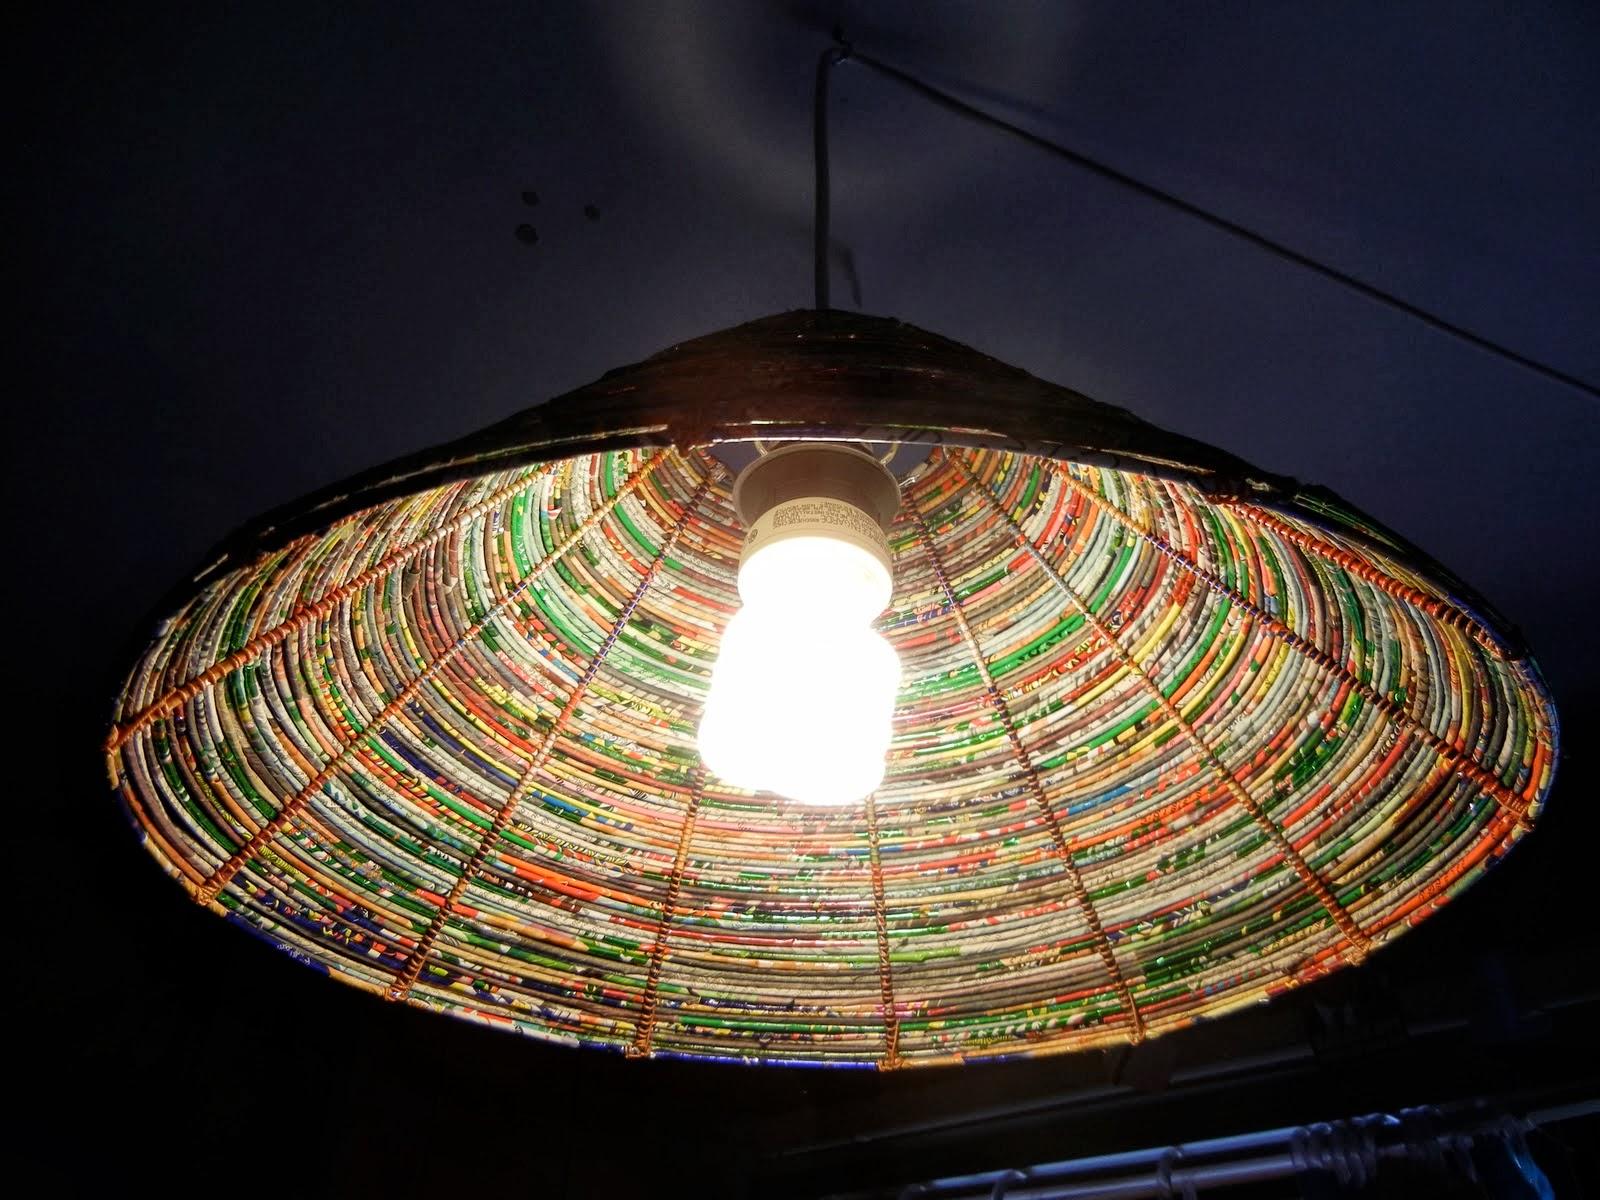 The Art Of Up-Cycling: Diy Lamp Shades - Made From Junk ...